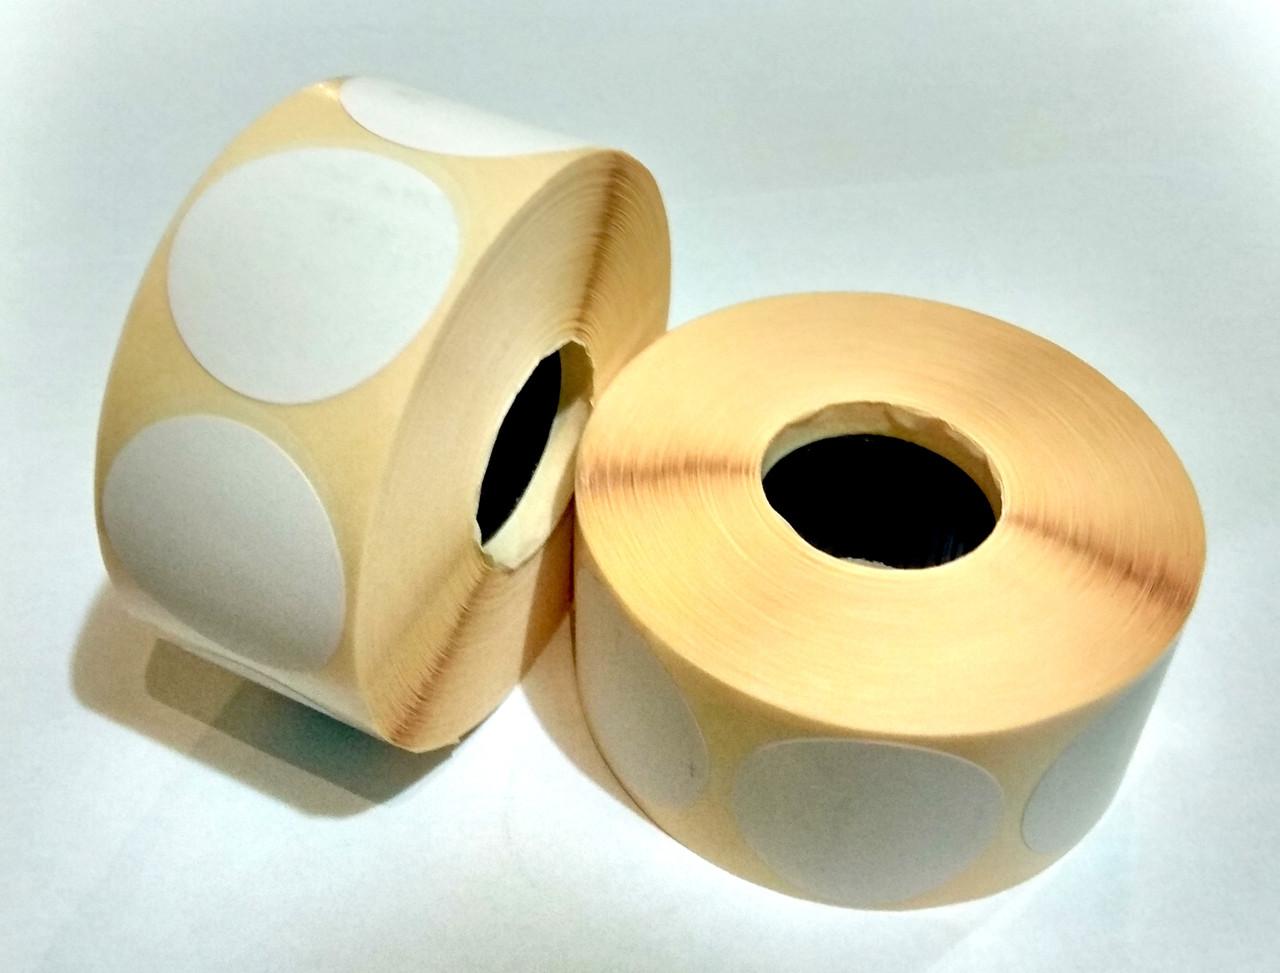 Mobitehnika Термоетикетка для етикеточних принтерів Т. еко коло 40 1000шт